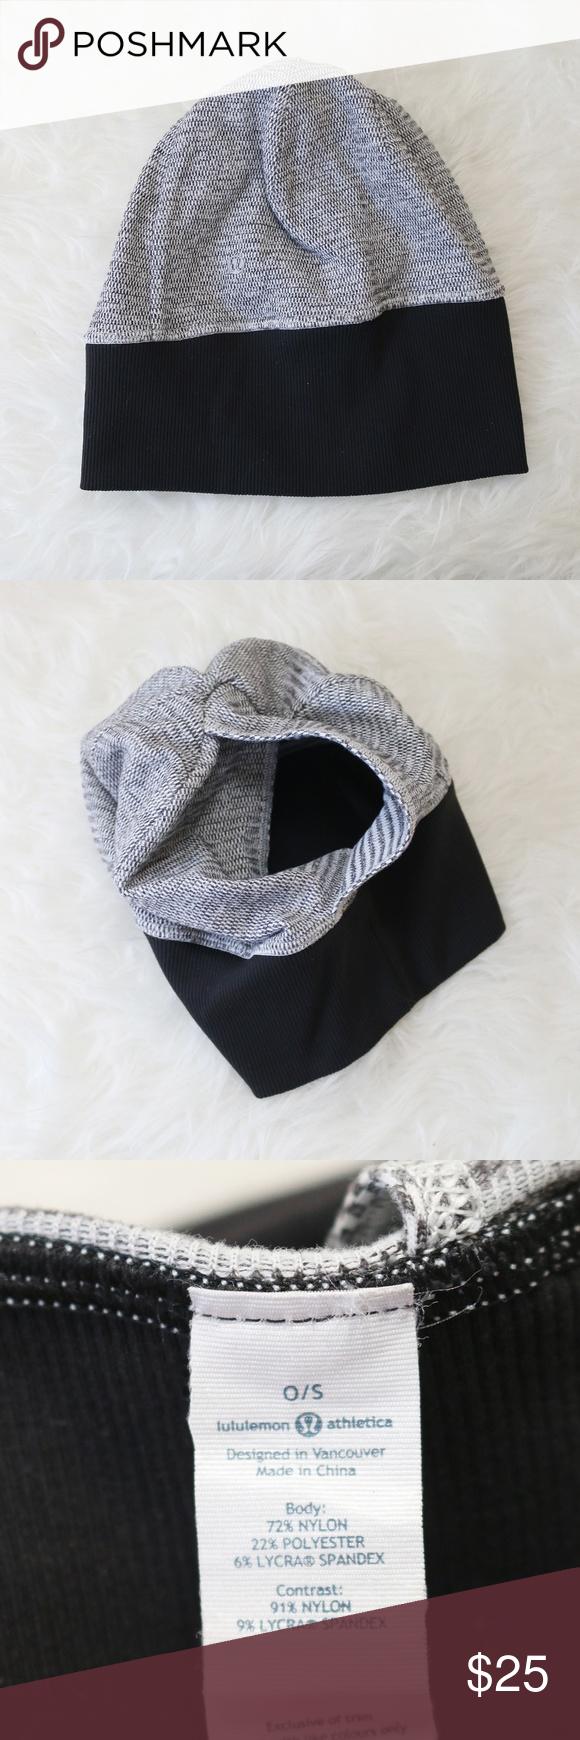 fdd12d376cb Lululemon Beanie Hat Soft Ponytail Hole Black Gray Lululemon. Soft  reversible cocoa pique hat with